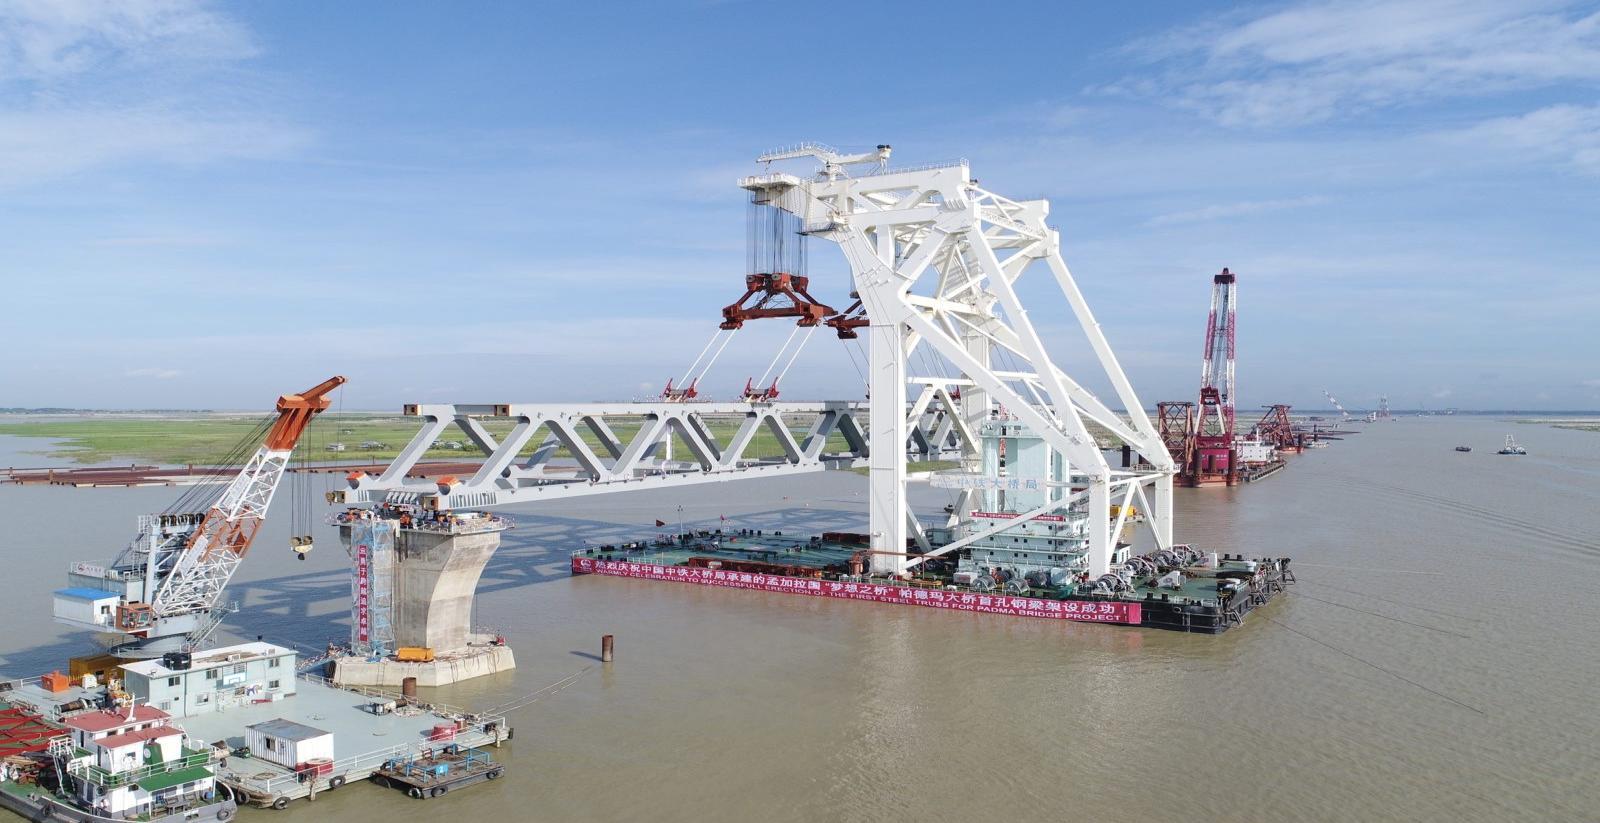 PADMA MULTIPURPOSE BRIDGE PROJECT